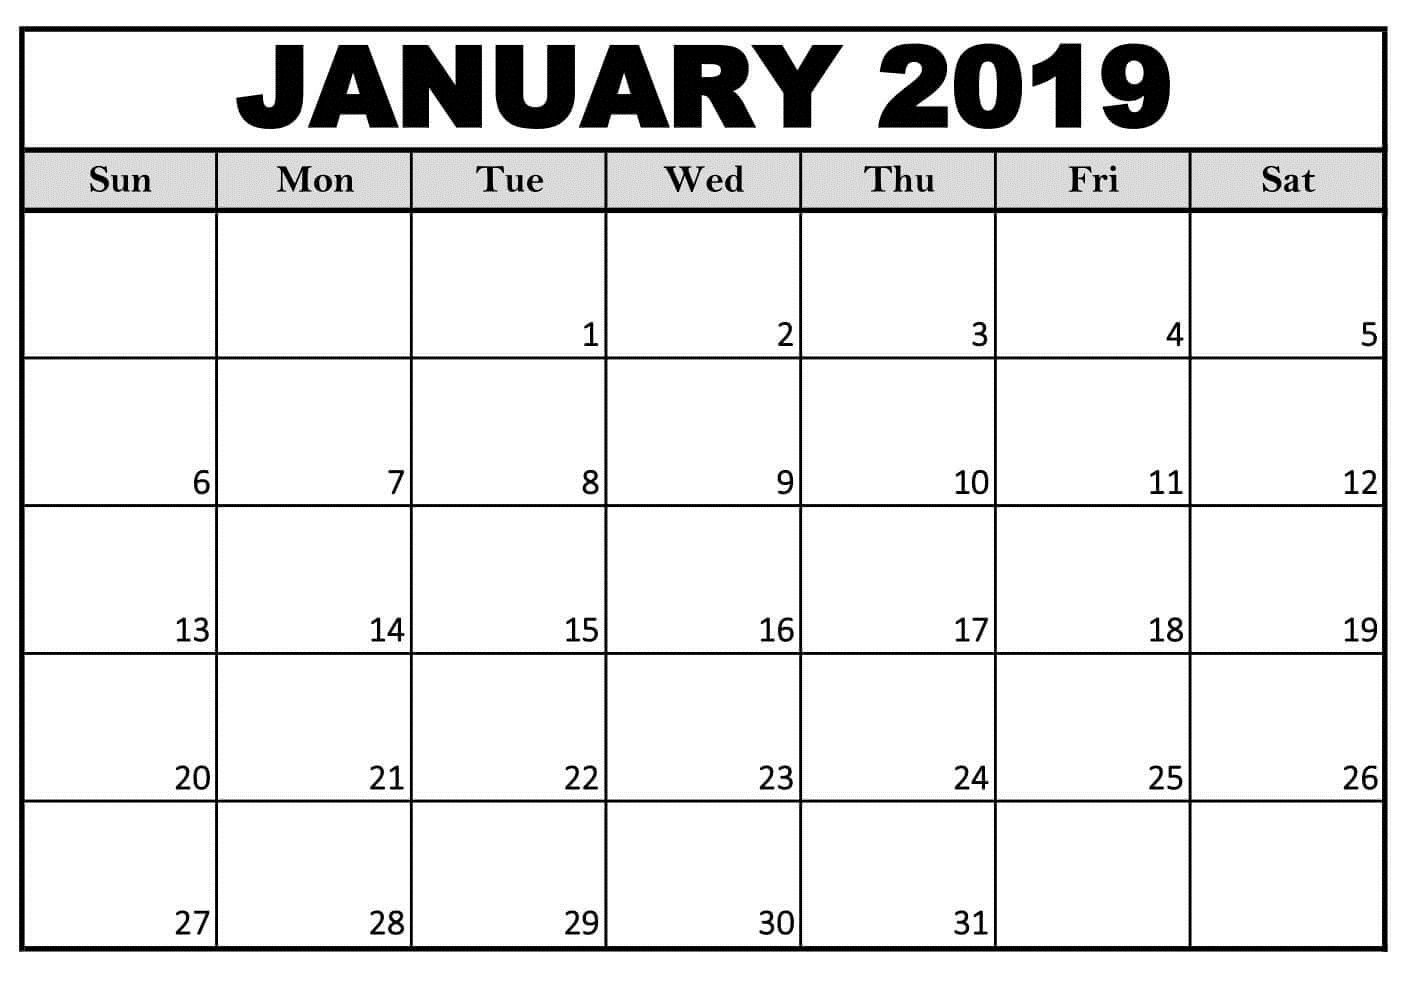 Printable January 2019 Calendar Decorative | Free Printable